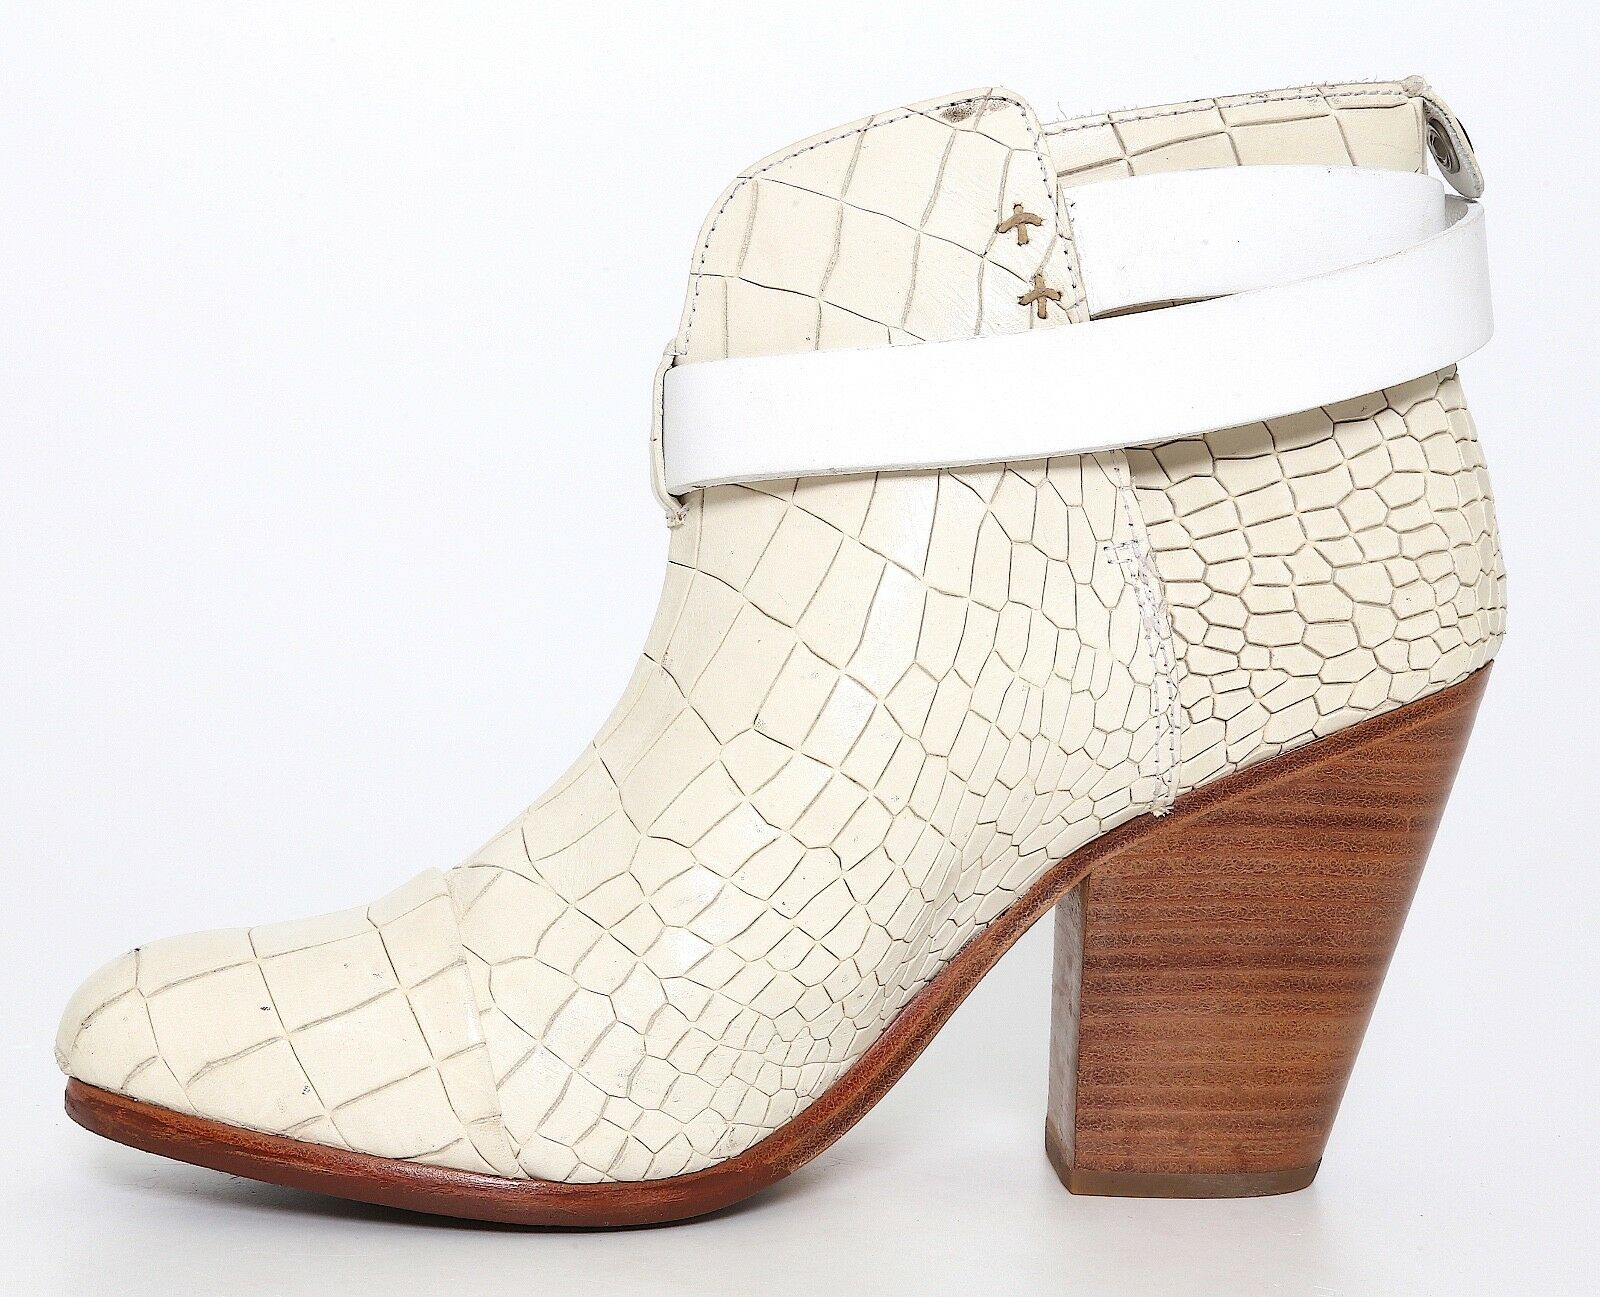 Rag & Bone Harrow Harrow Harrow Crocodile Embossed Ankle Boots Ivory Women Sz 38 EUR 5026 90f7f5